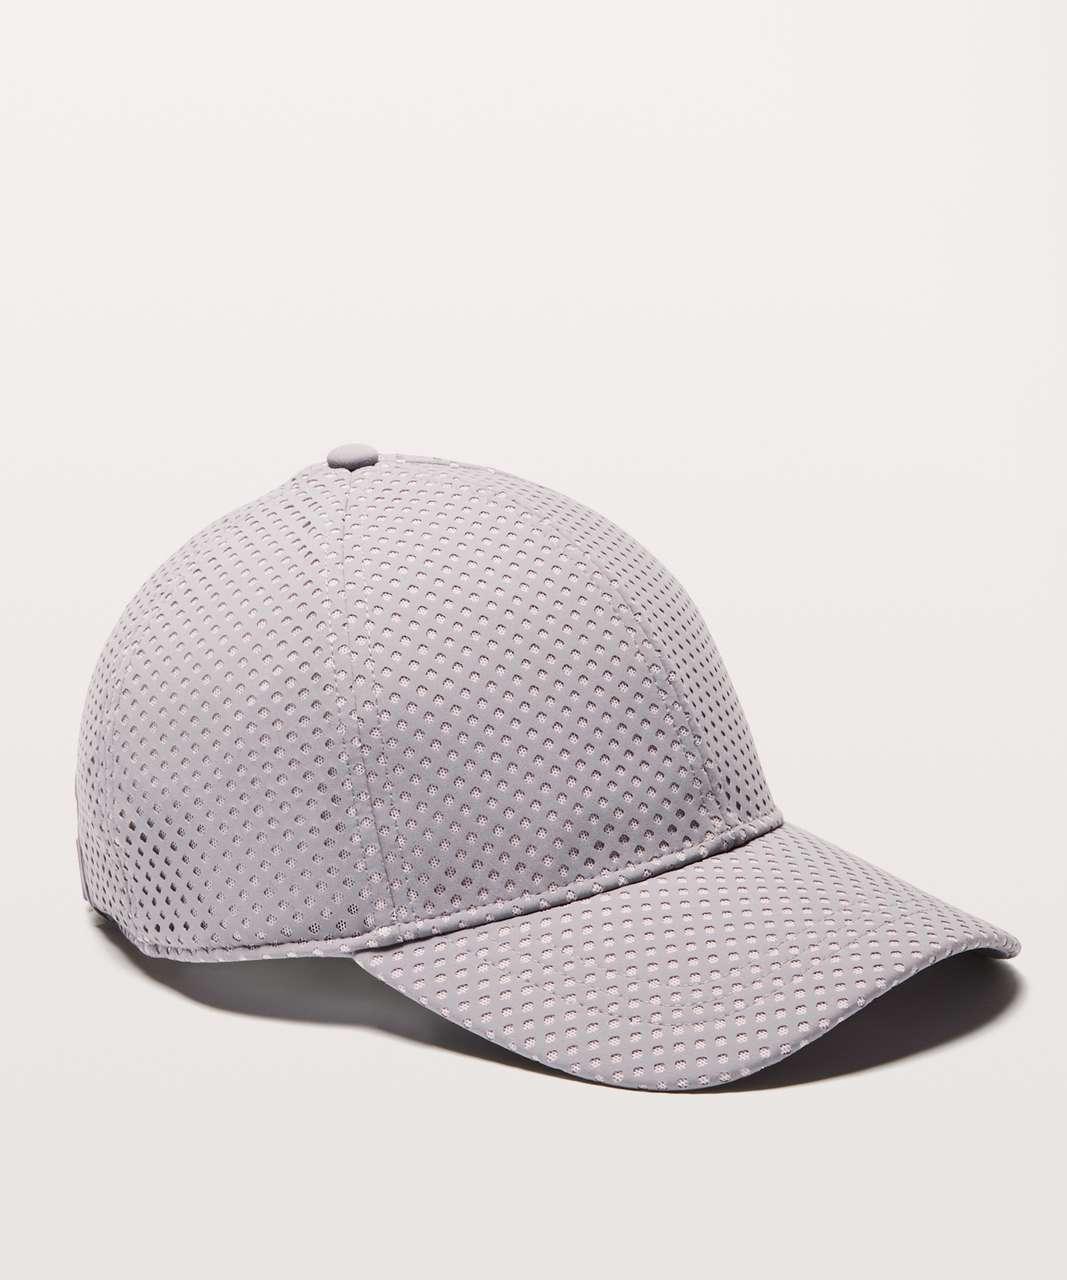 Lululemon Baller Hat *Breeze - Dusty Dawn / Porcelain Pink